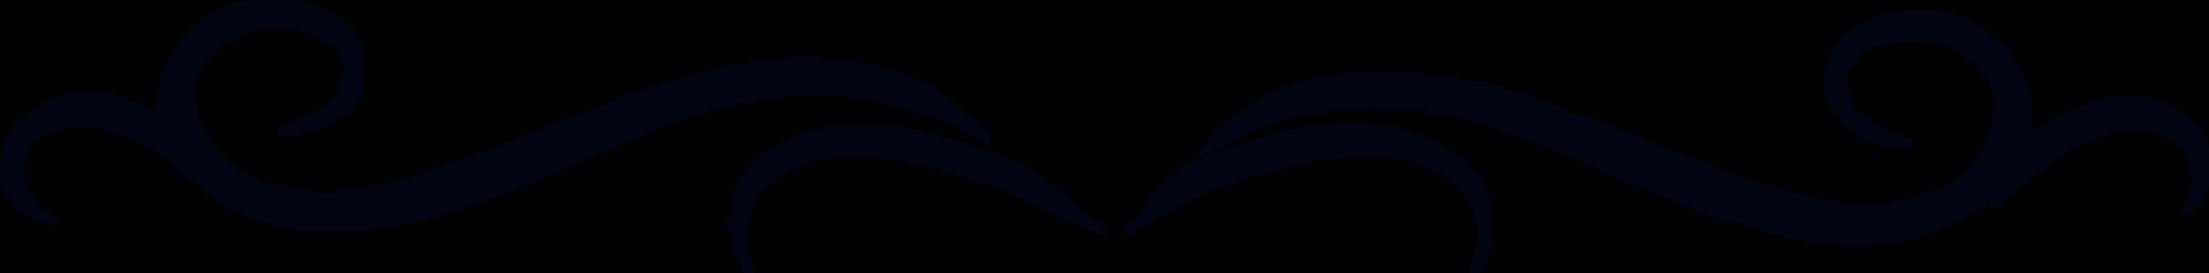 Transparent simple flourish png - Black Scroll Design - Single Line Clipart